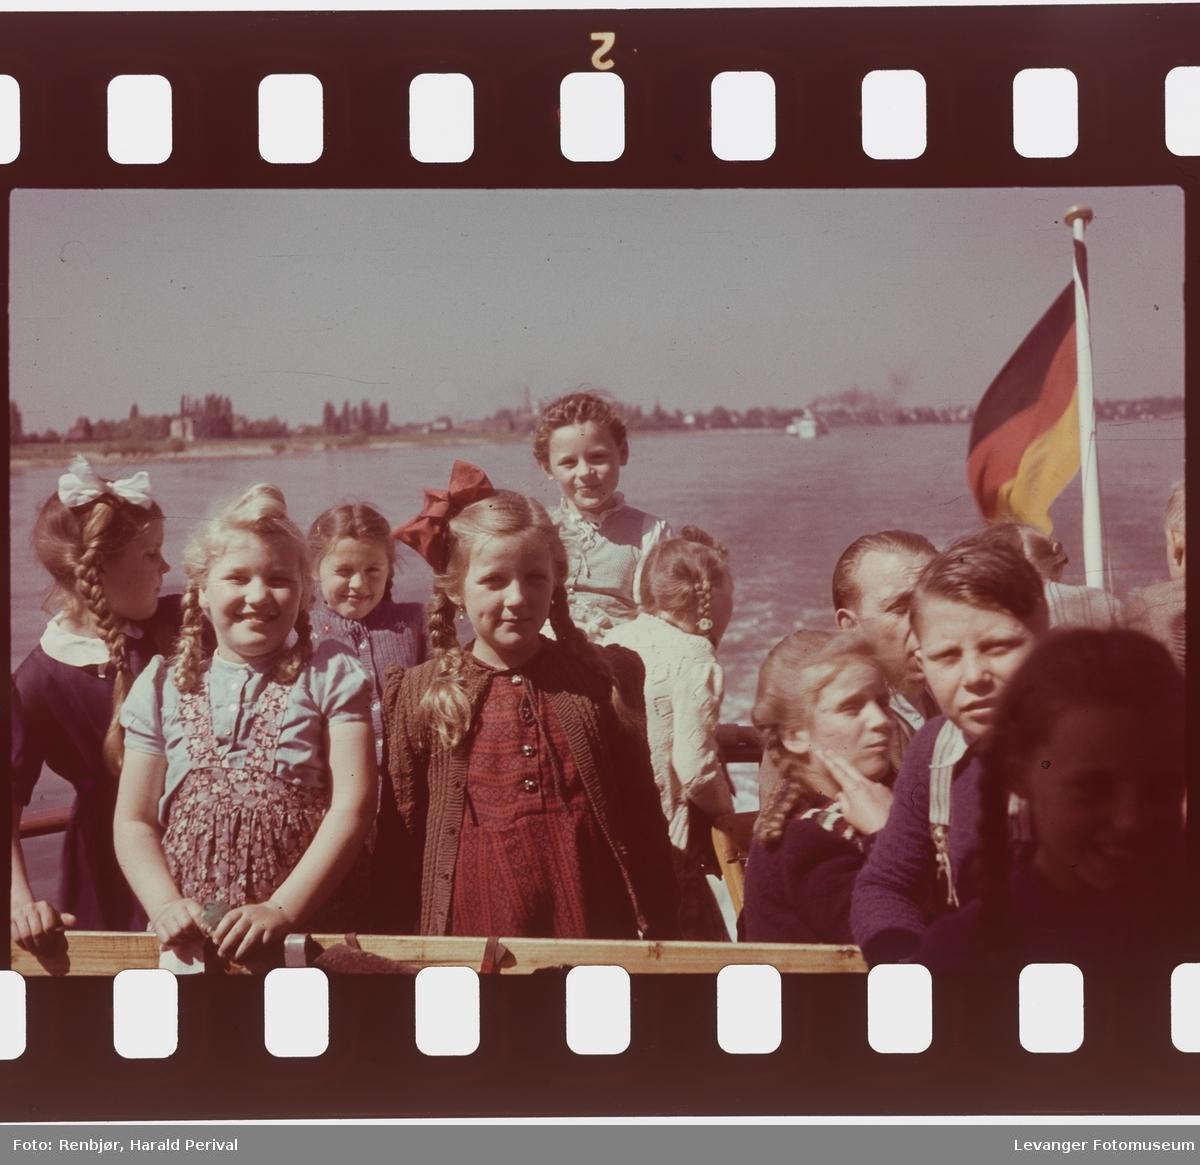 Fra Tyskland i forbindelse med deltakingen på den årlige Fotomessen i Køln. Båtttur på Rhinen.